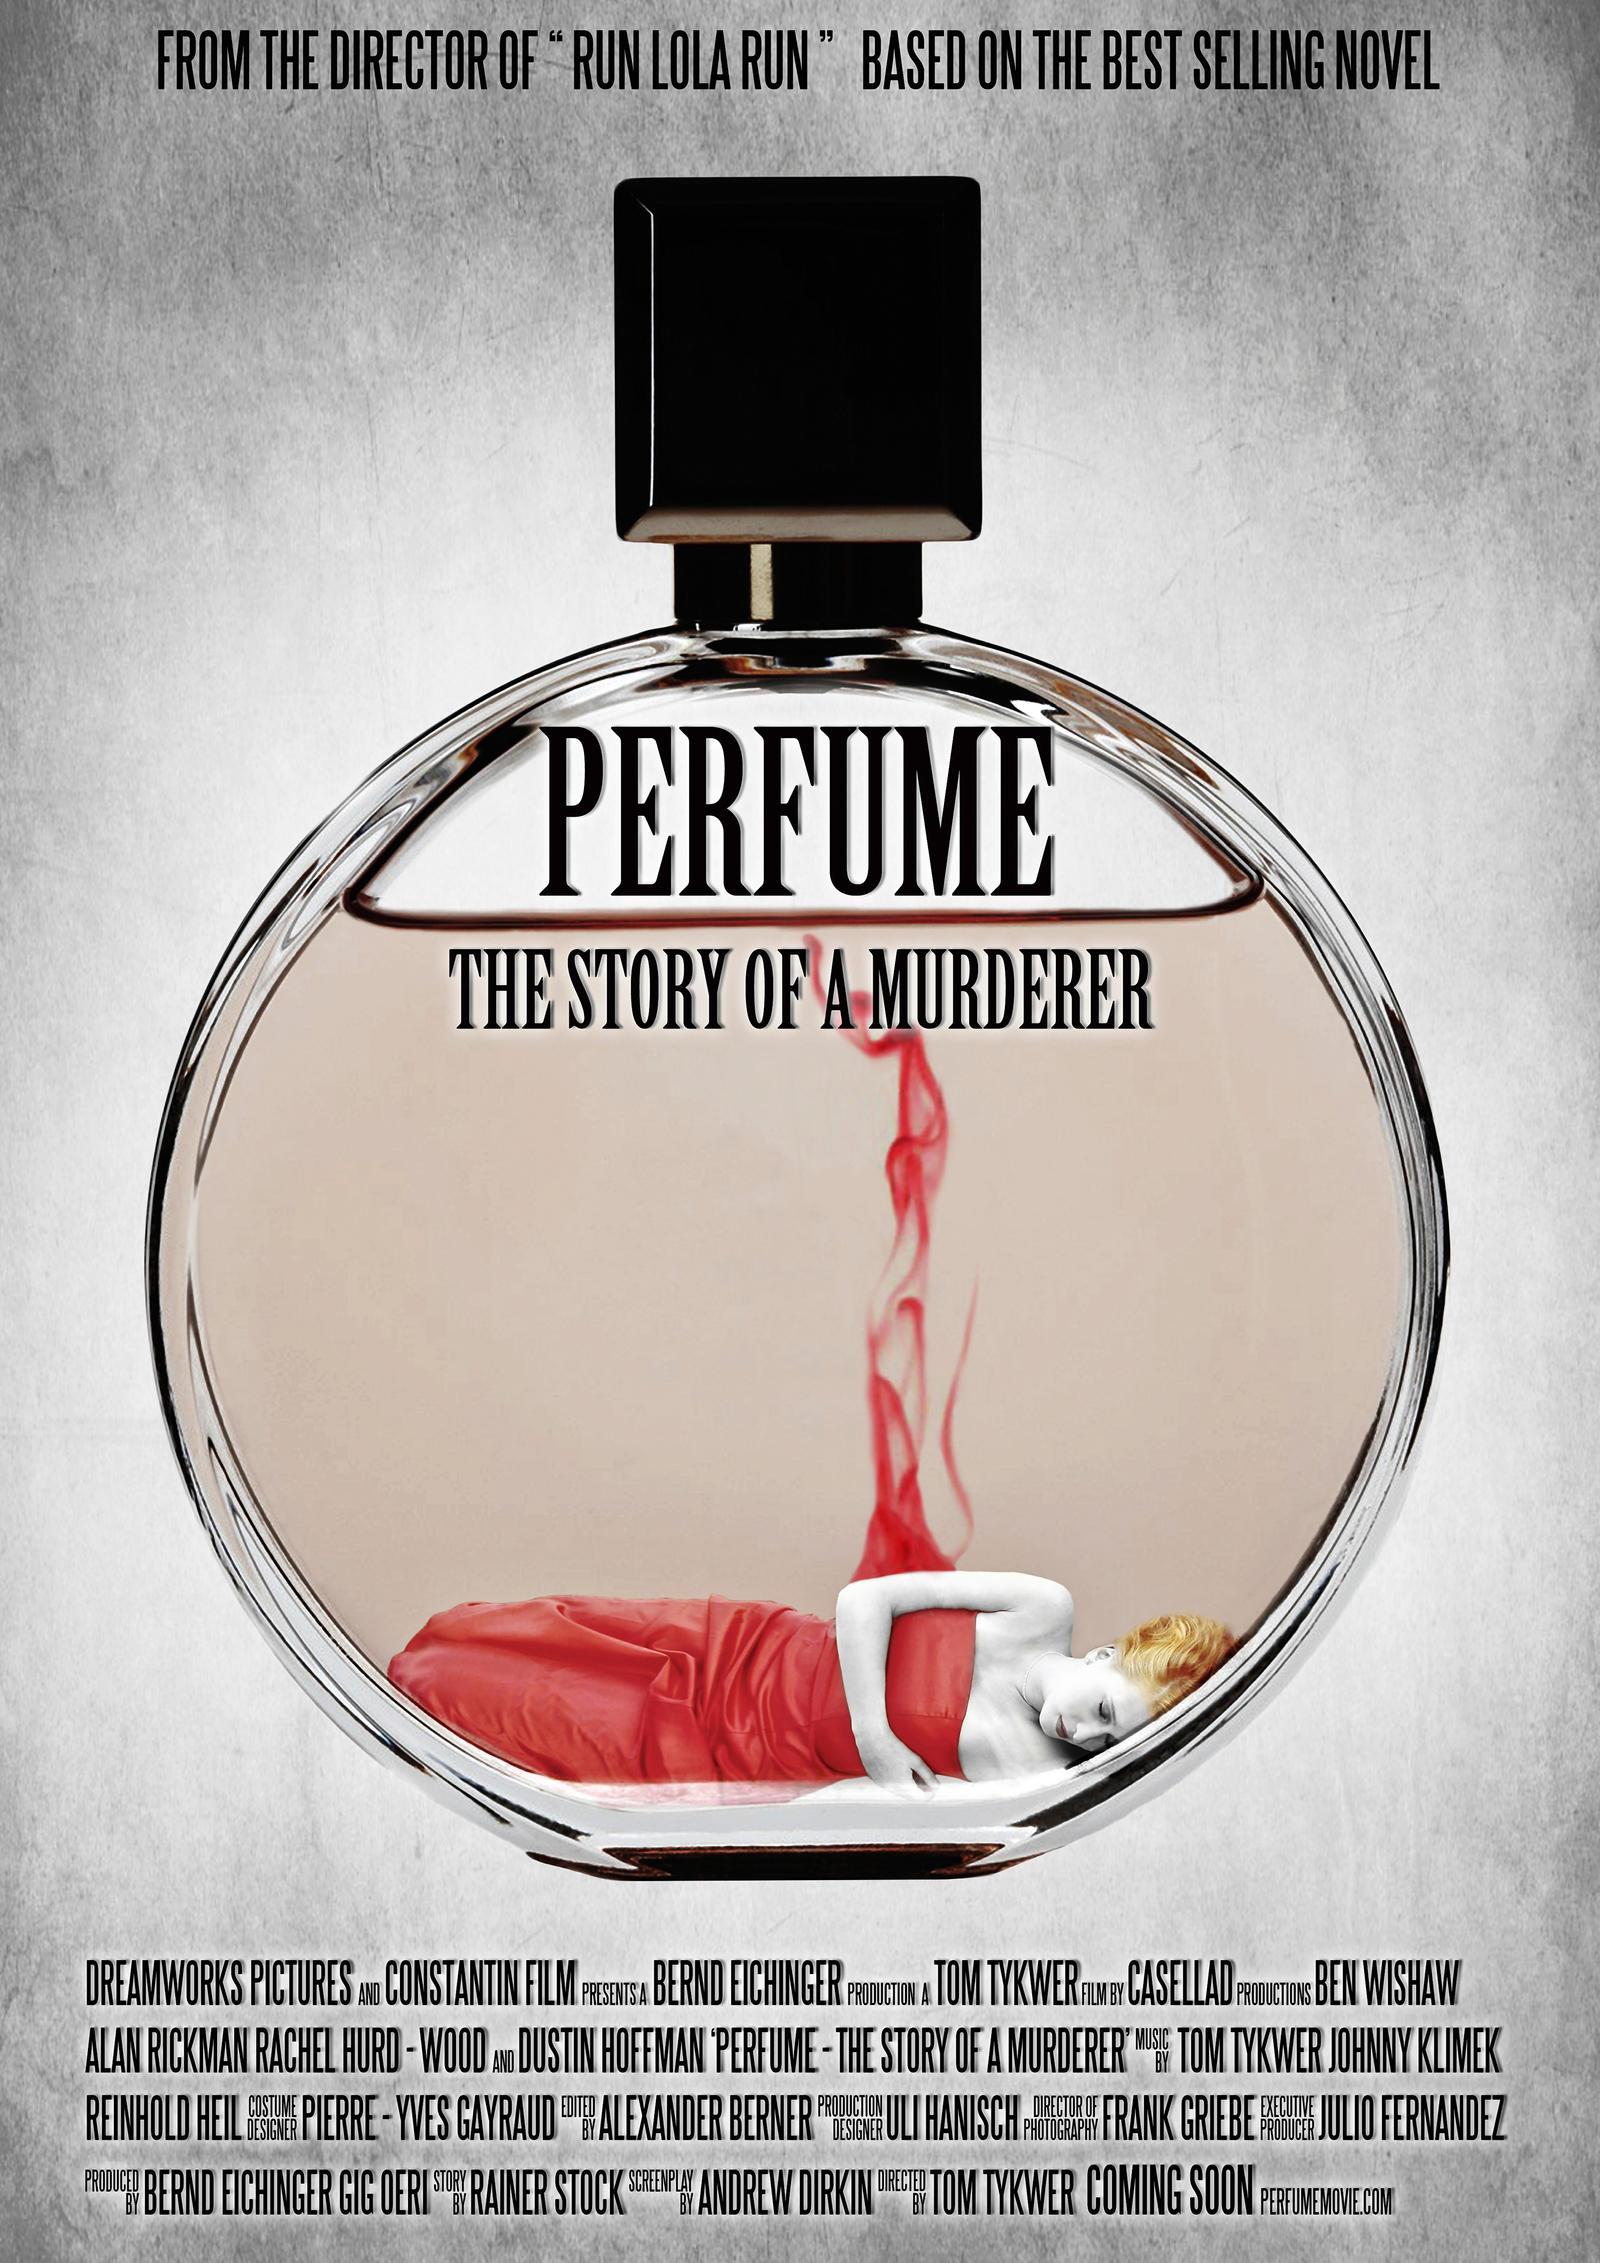 essay perfume essay perfume perfume advertisement analysis essay don t hesitate perfume the story of a murderer